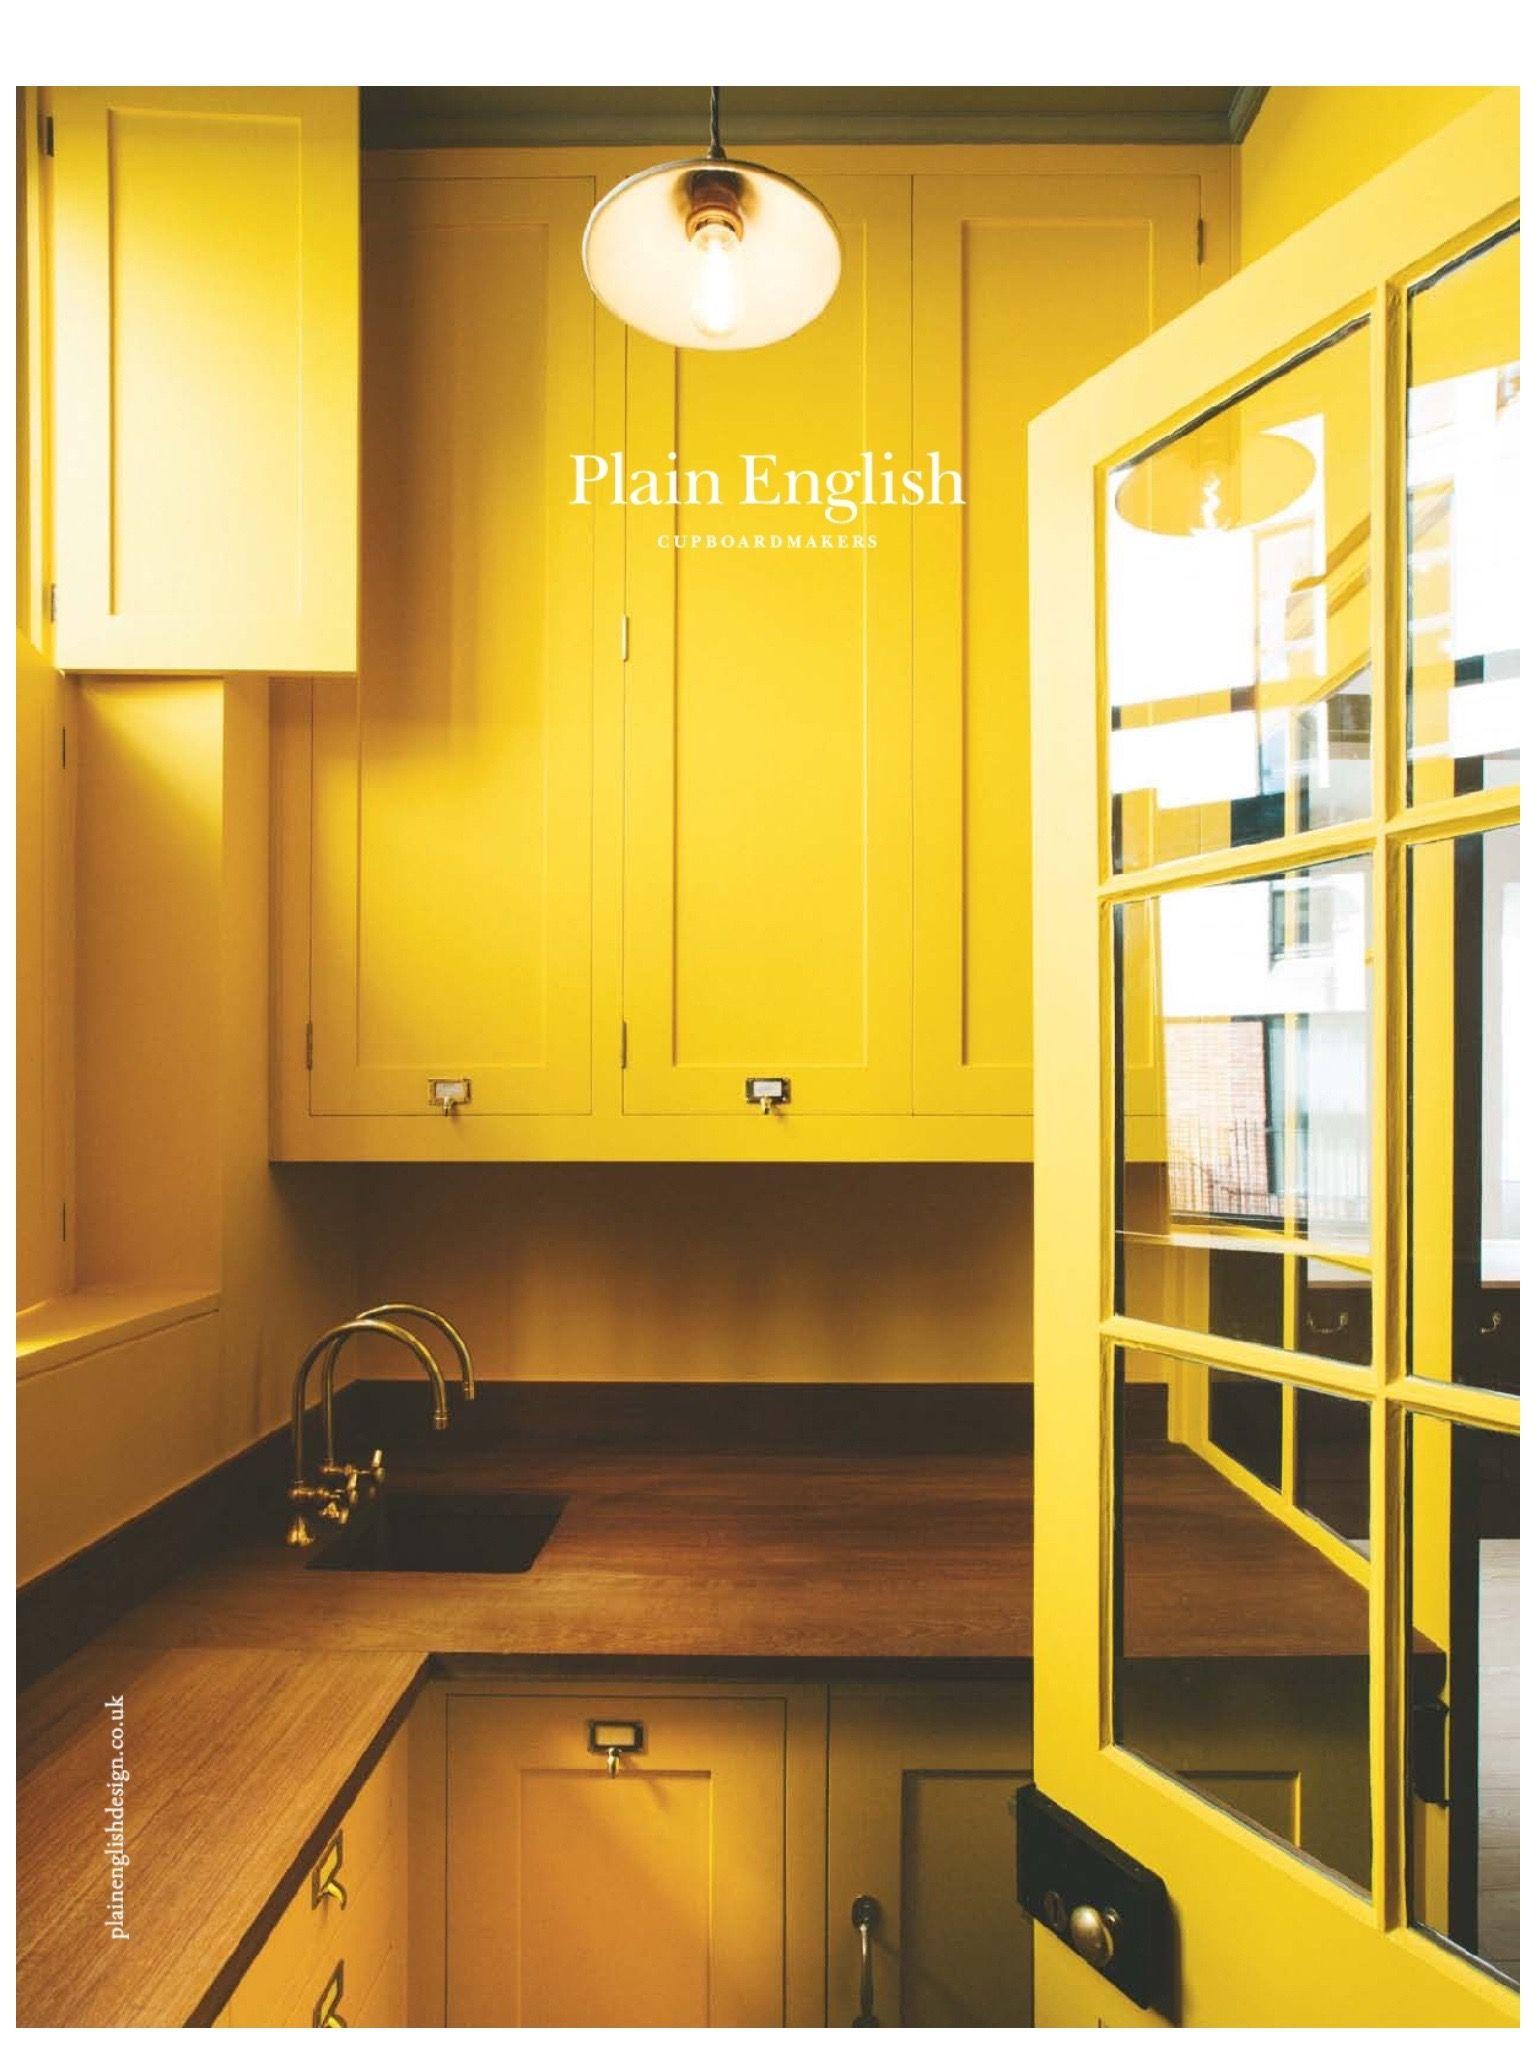 yellow kitchen english kitchens design plain english kitchen yellow kitchen cupboards on kitchen yellow id=94027